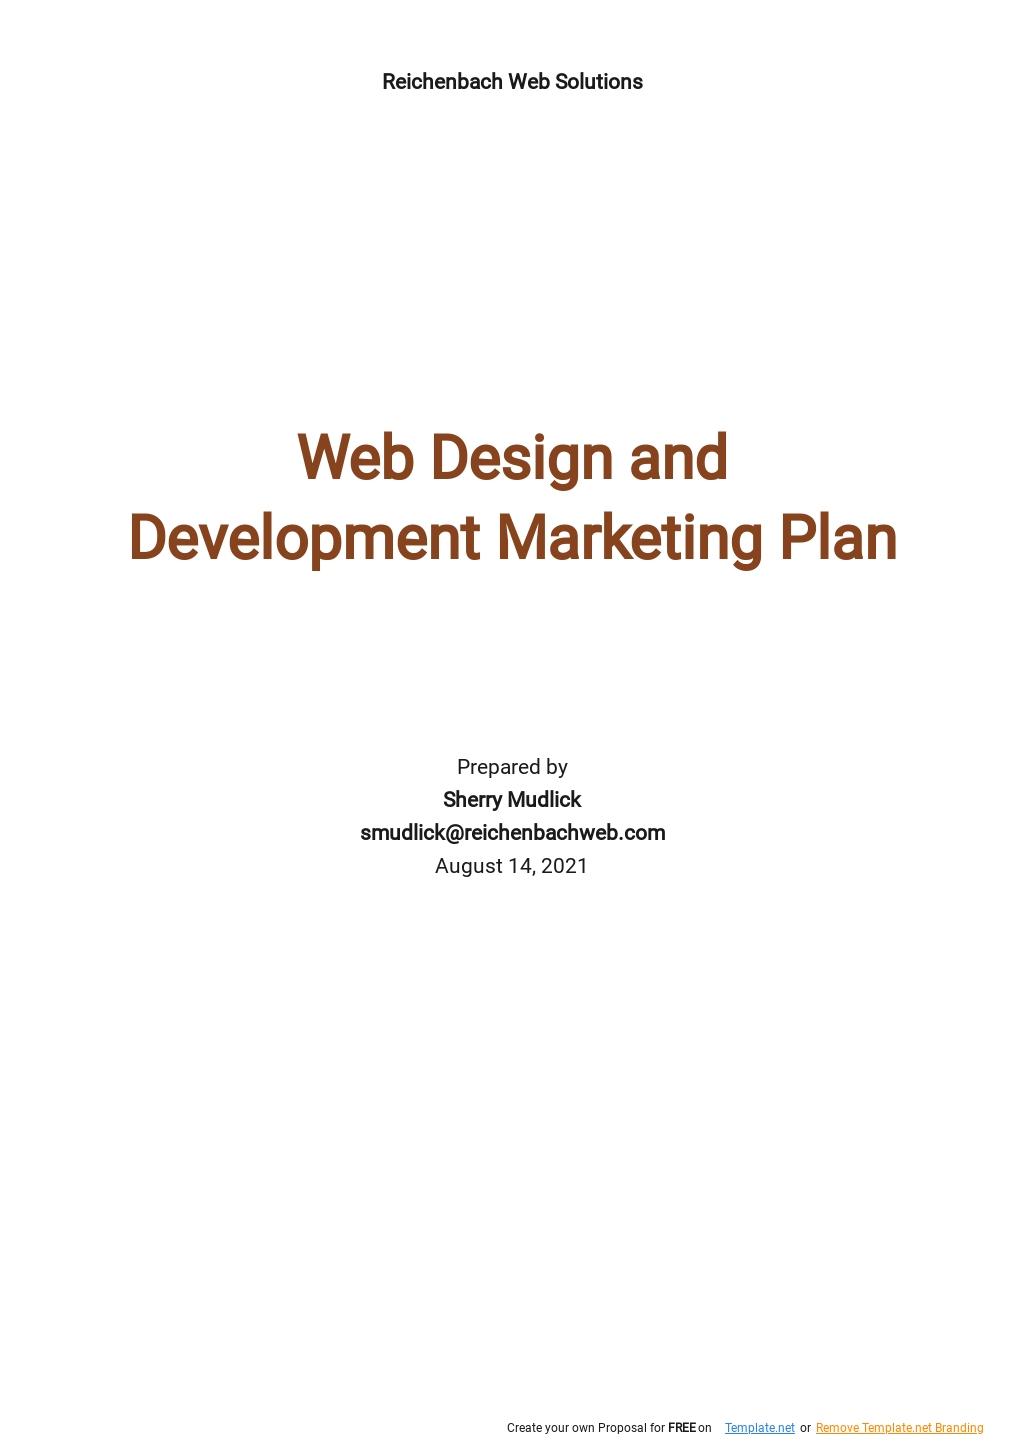 Web Design and Development Marketing Plan Template.jpe